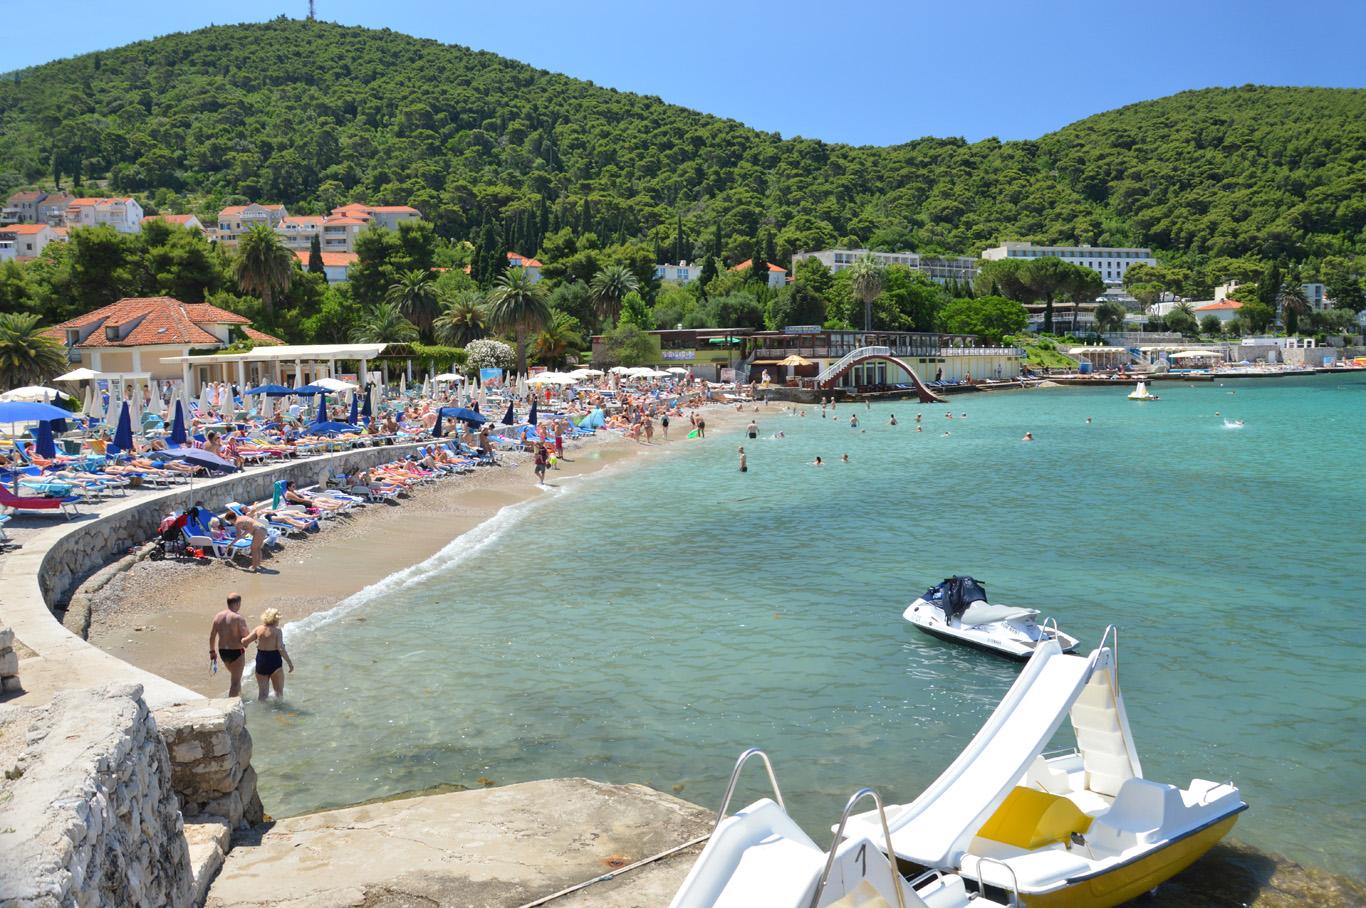 Lapad beach